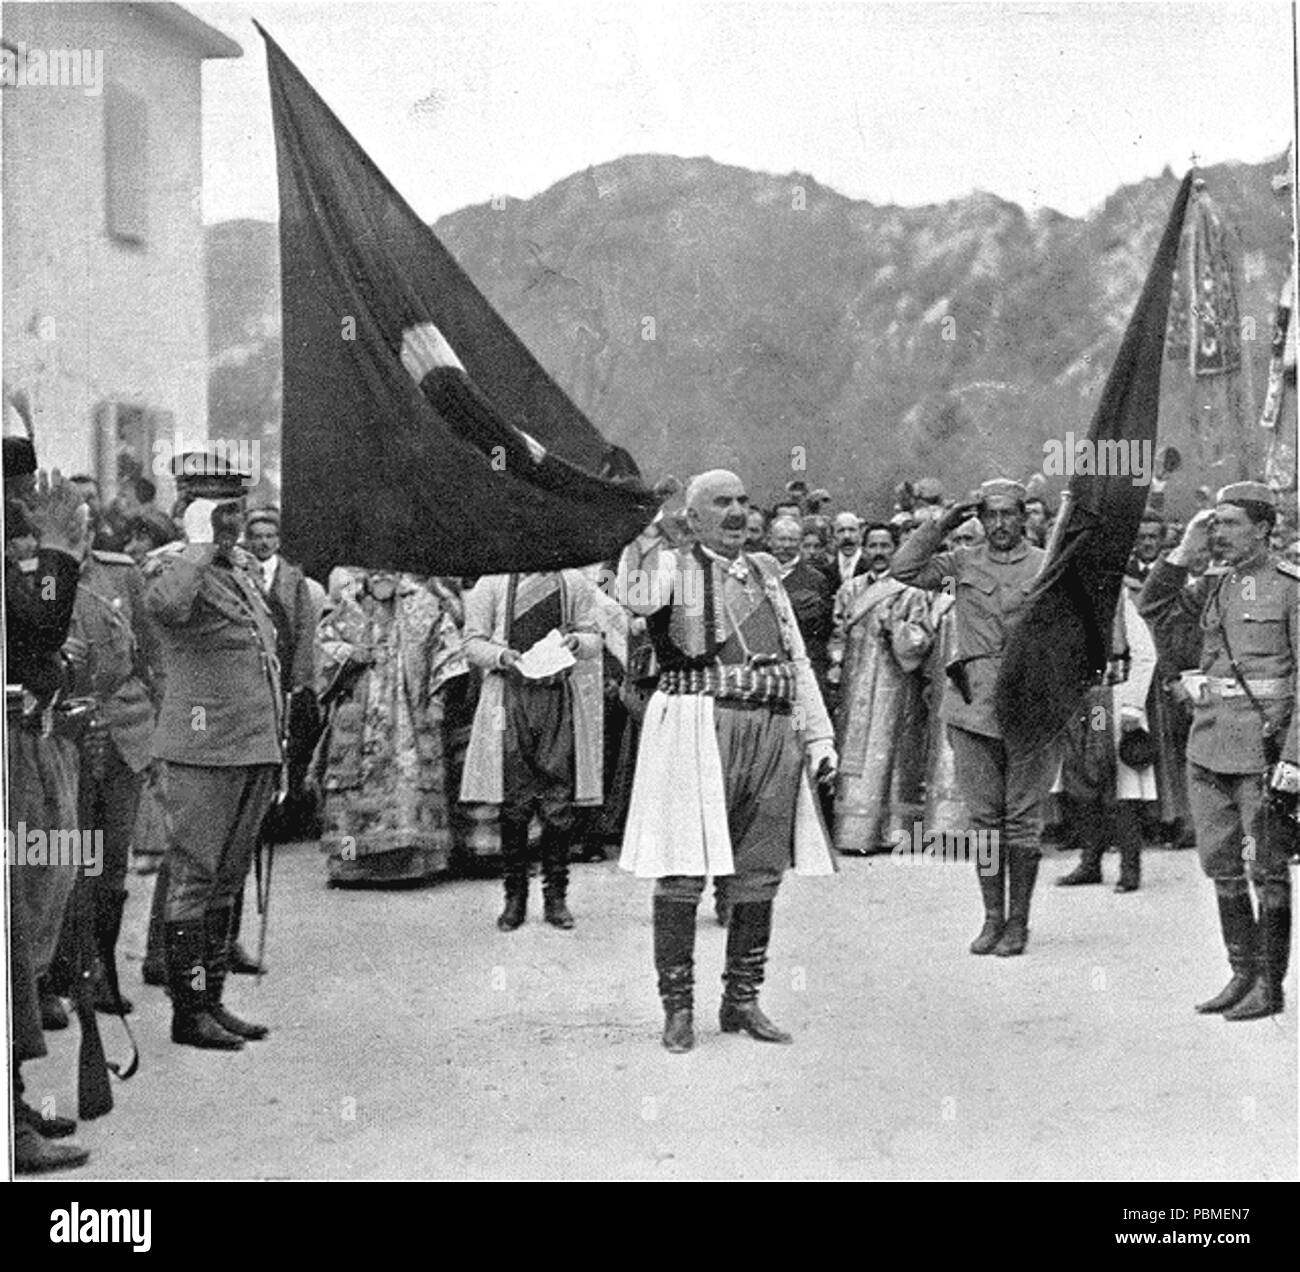 861 King Nicholas of Montenegro with captured Ottoman flag Stock Photo